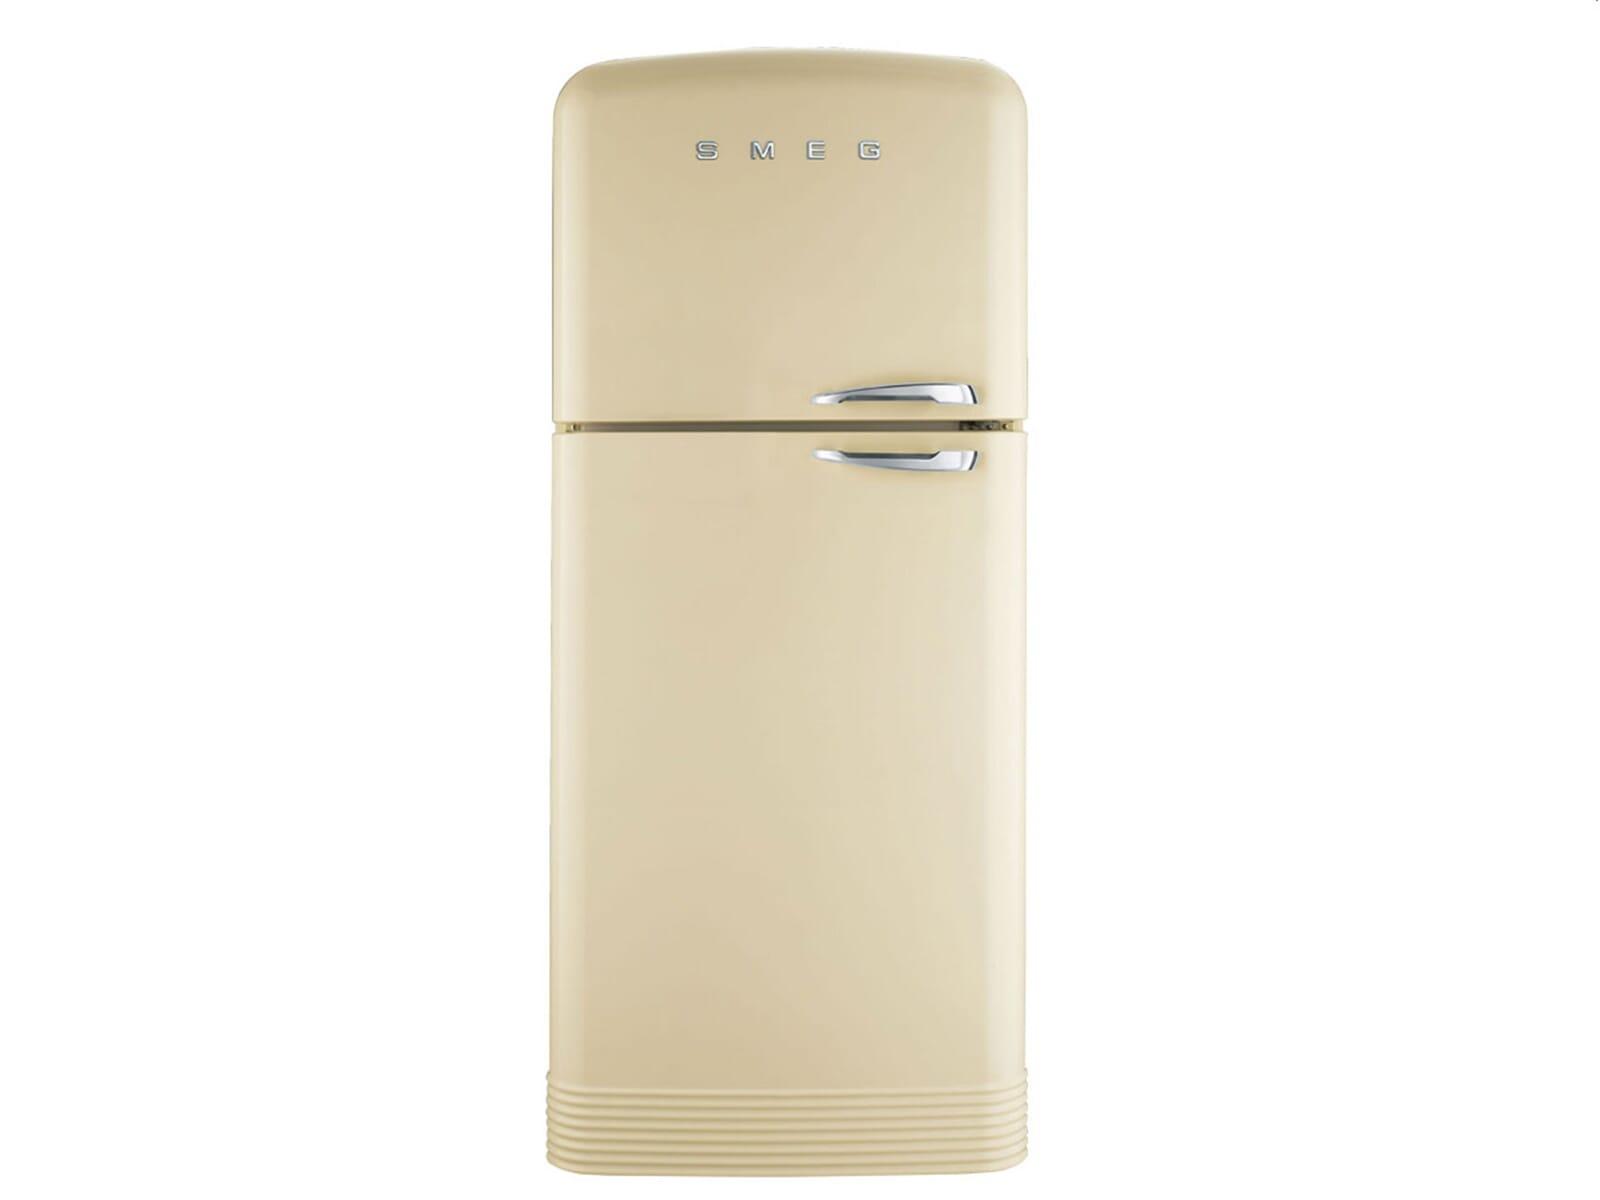 Gorenje Kühlschrank Retro Rot : Retro kühlschrank günstig gorenje kühlschrank rot retro